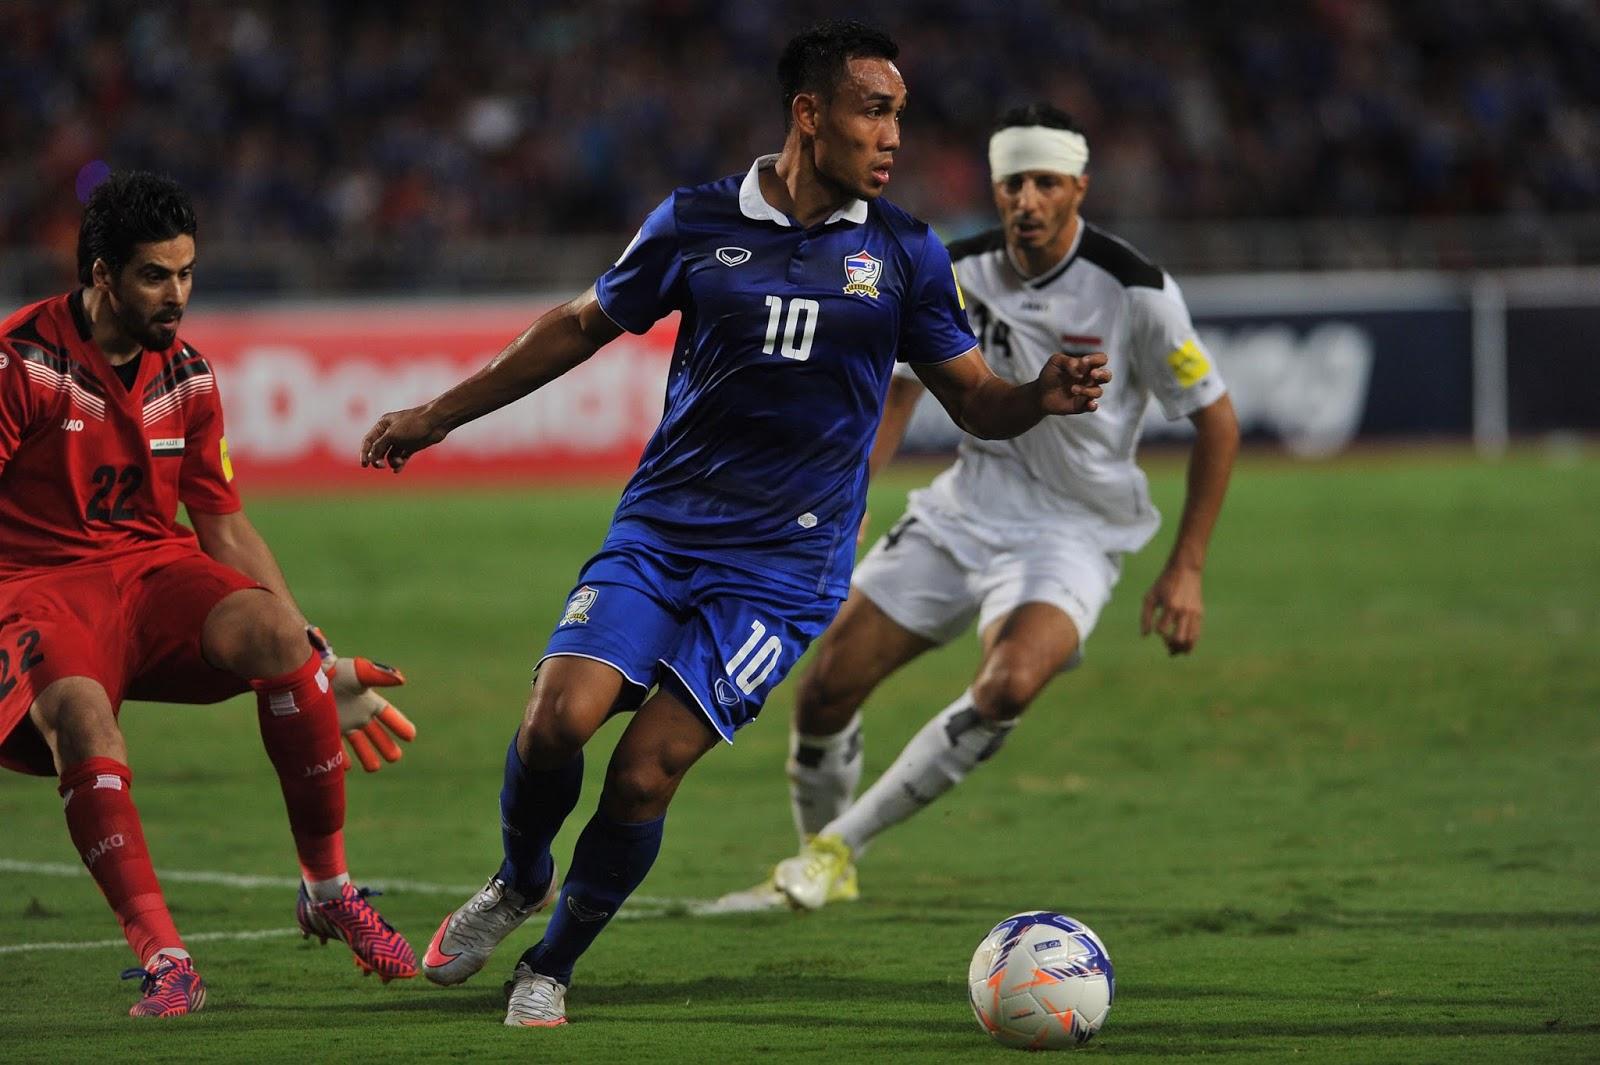 Link Duball : ดูบอลออนไลน์ ดูบอลสด ทีเด็ดฟุตบอล ฟุตบอลไทย ข่าวกีฬา วิเคราะห์ บอลวันนี้ สปอร์ตพูล: COMMENT! แฟนบอลเวียดนาม กับการเป็นจ่าฝูงของทีมชาติไทย